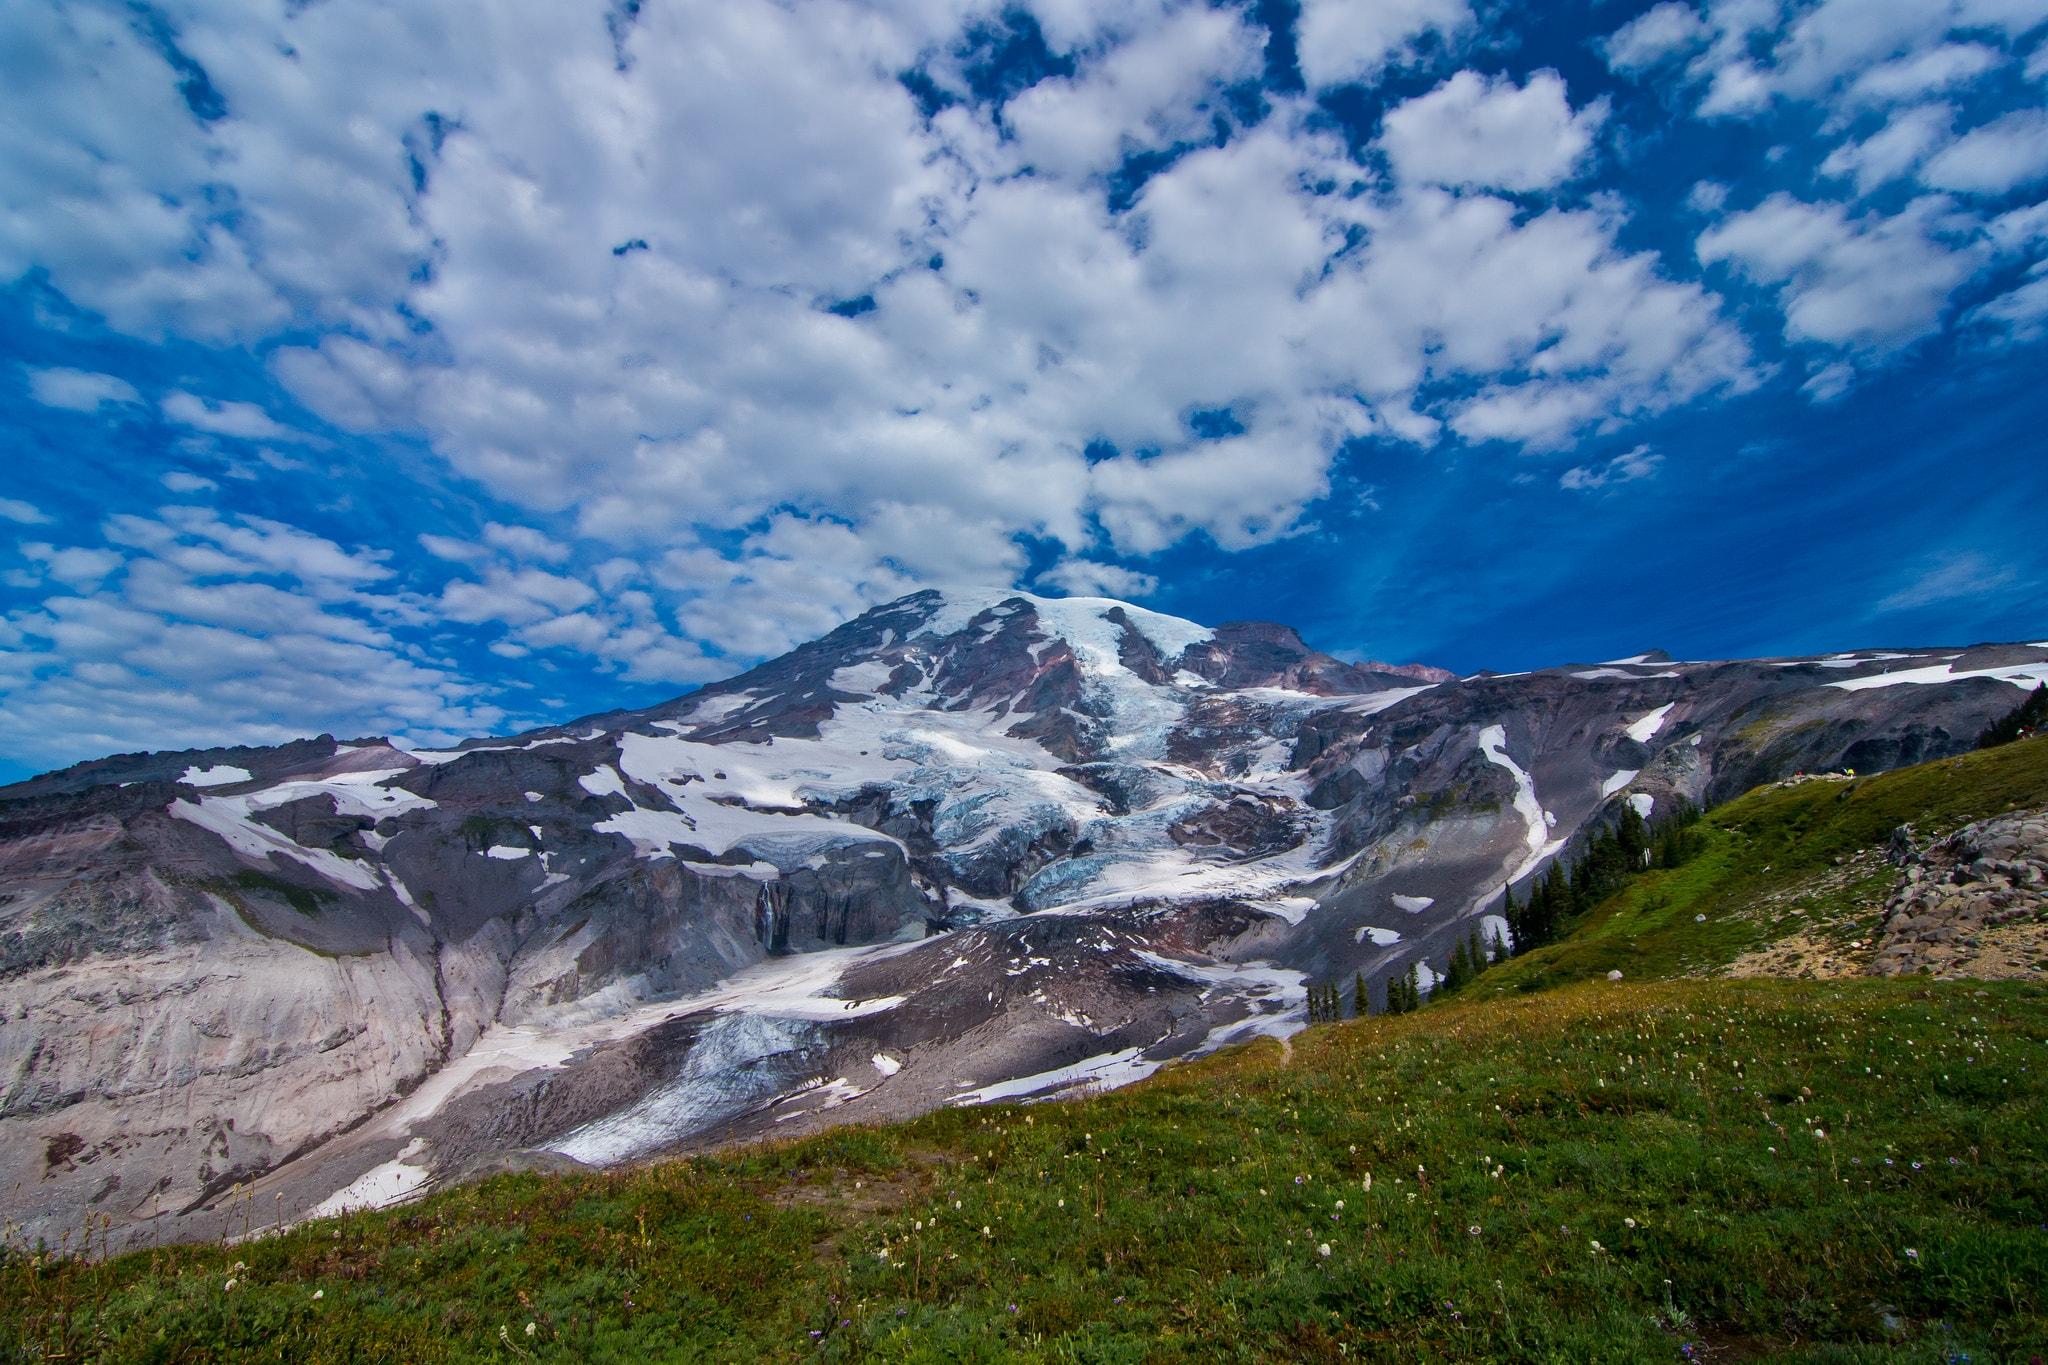 Mt. Rainier National Park | © Albert Sague / Flickr